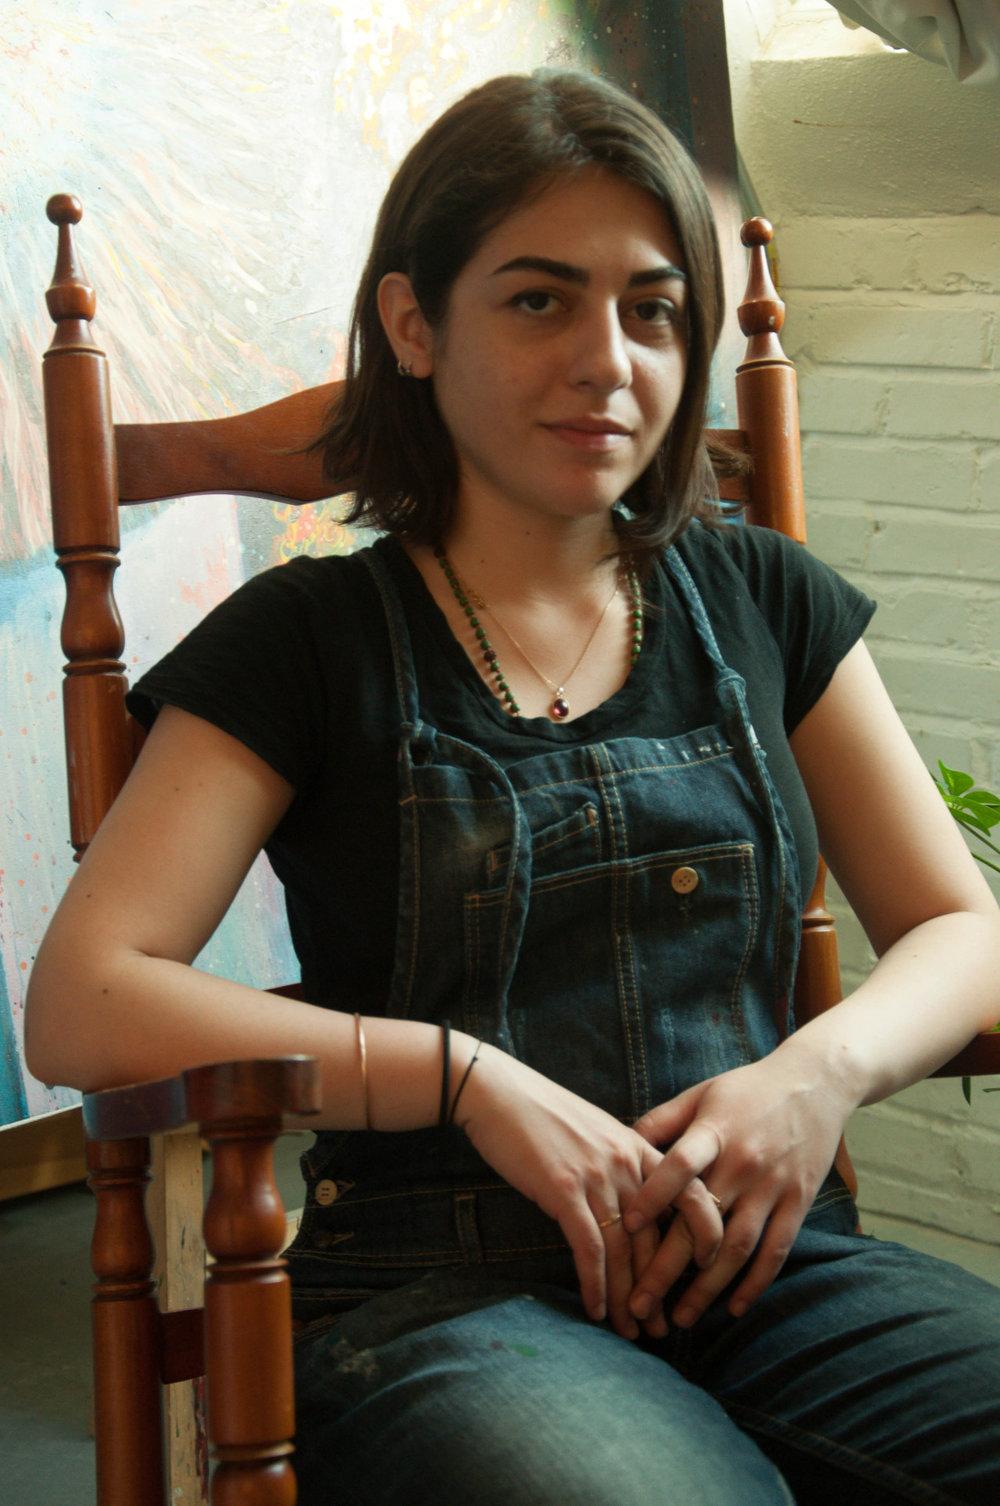 photo, intro: Jennifer Sparrowhawk